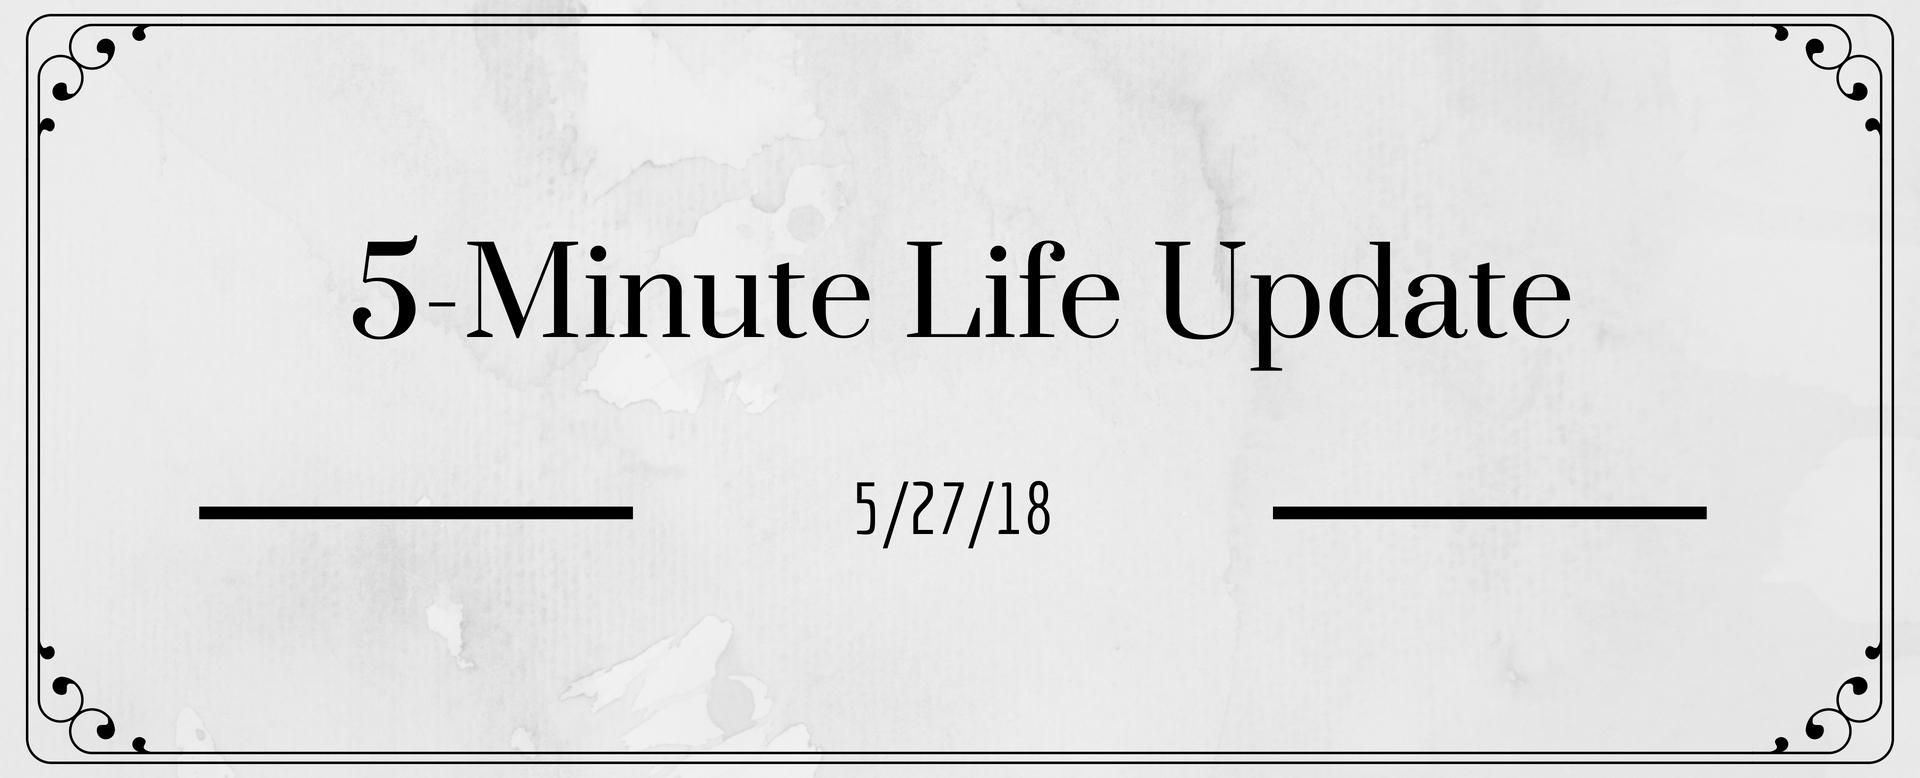 5 Minute Life Update 5/27/18